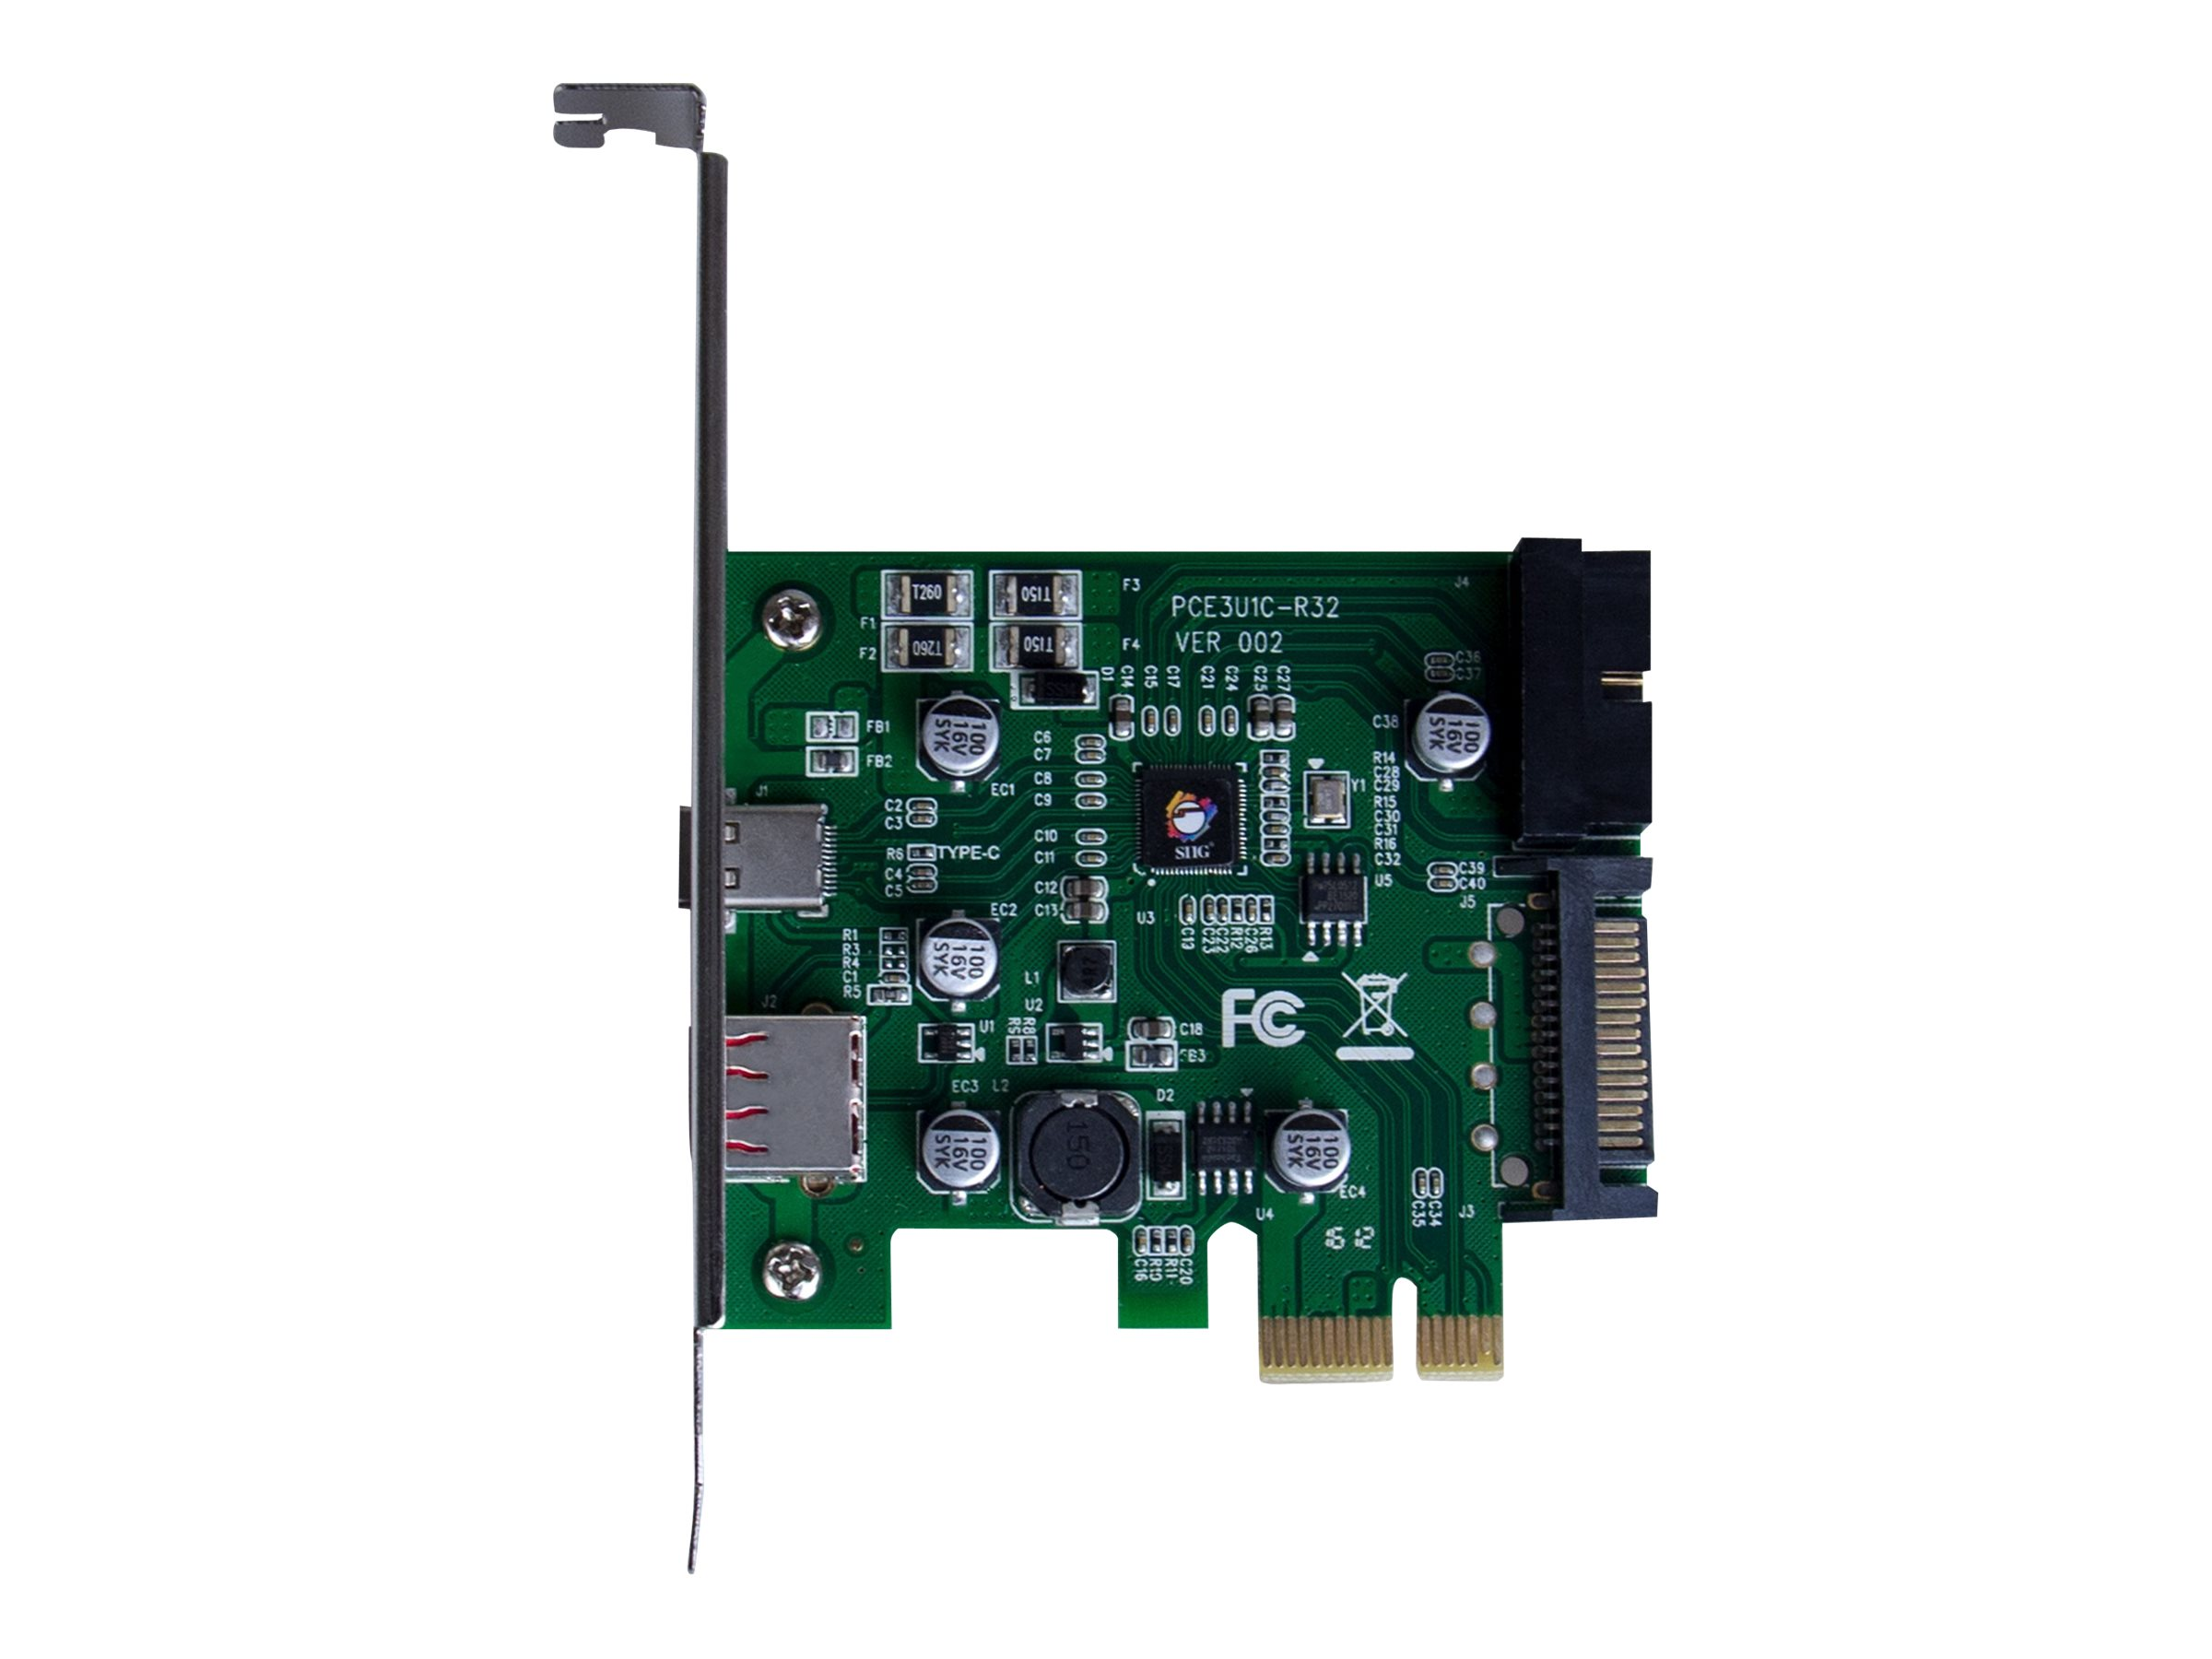 SIIG JU-P20C11-S1 - USB adapter - PCIe - USB (power only) x 1 + USB-C x 1 + USB 3.0 (internal) x 1